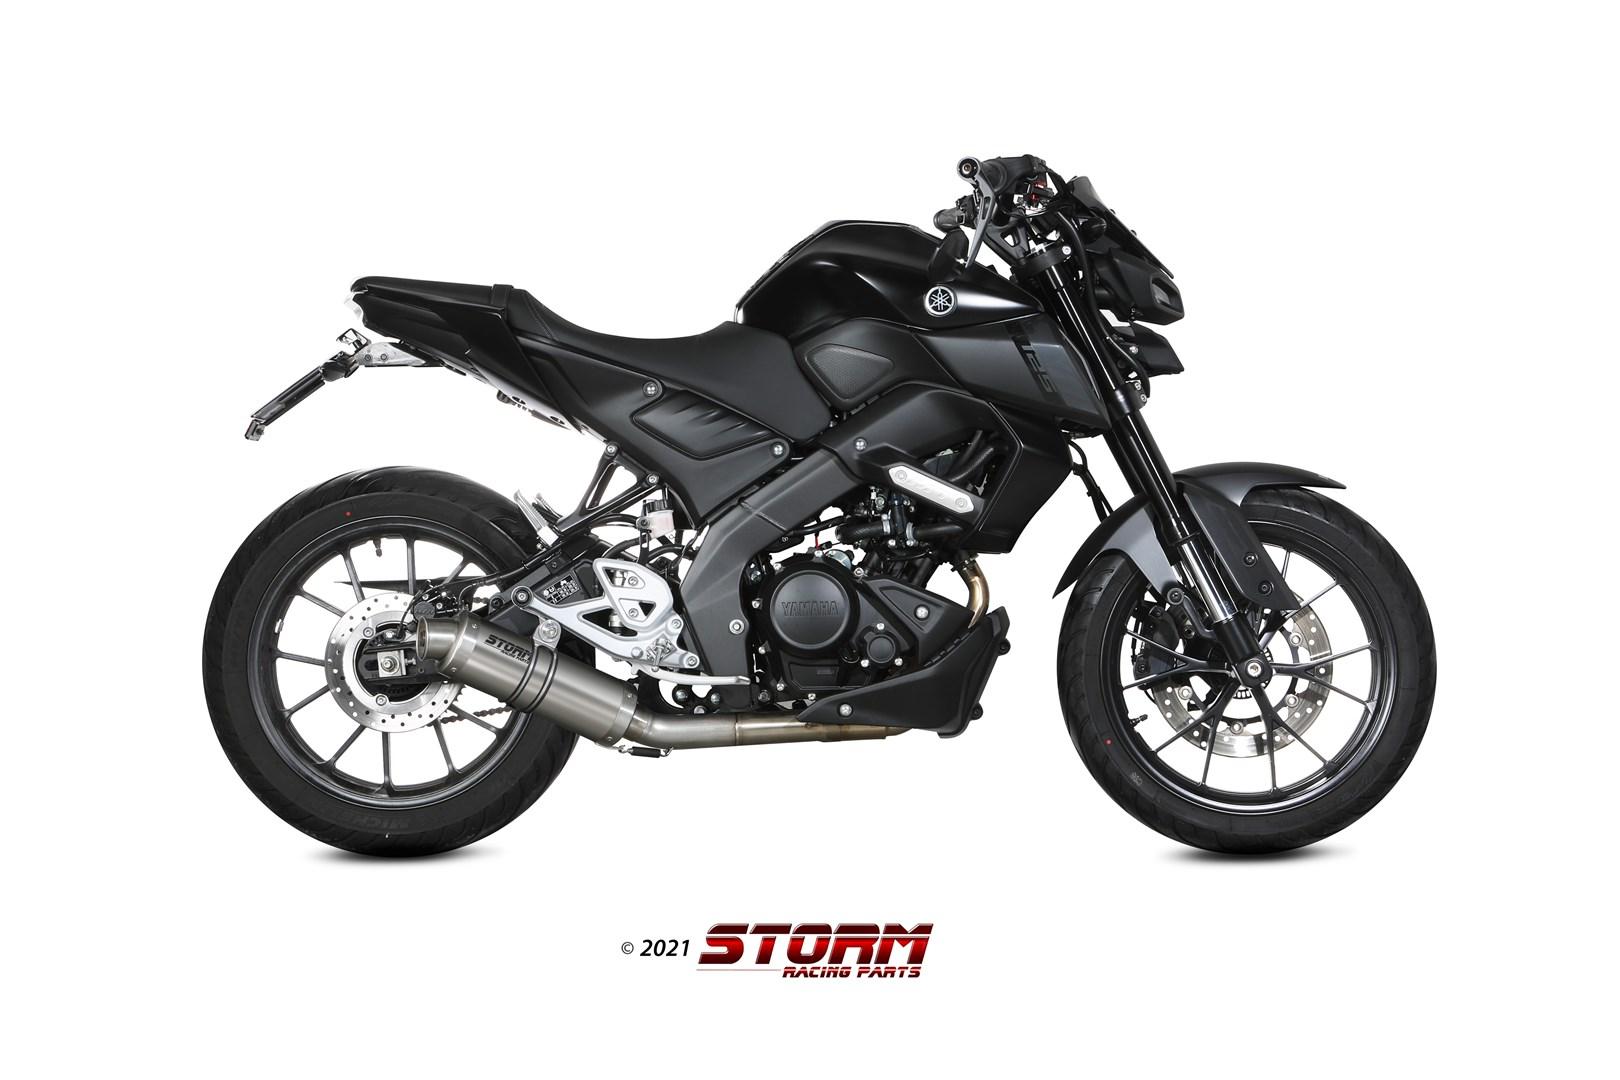 Yamaha_MT125_2021-_74Y067LXS_$01